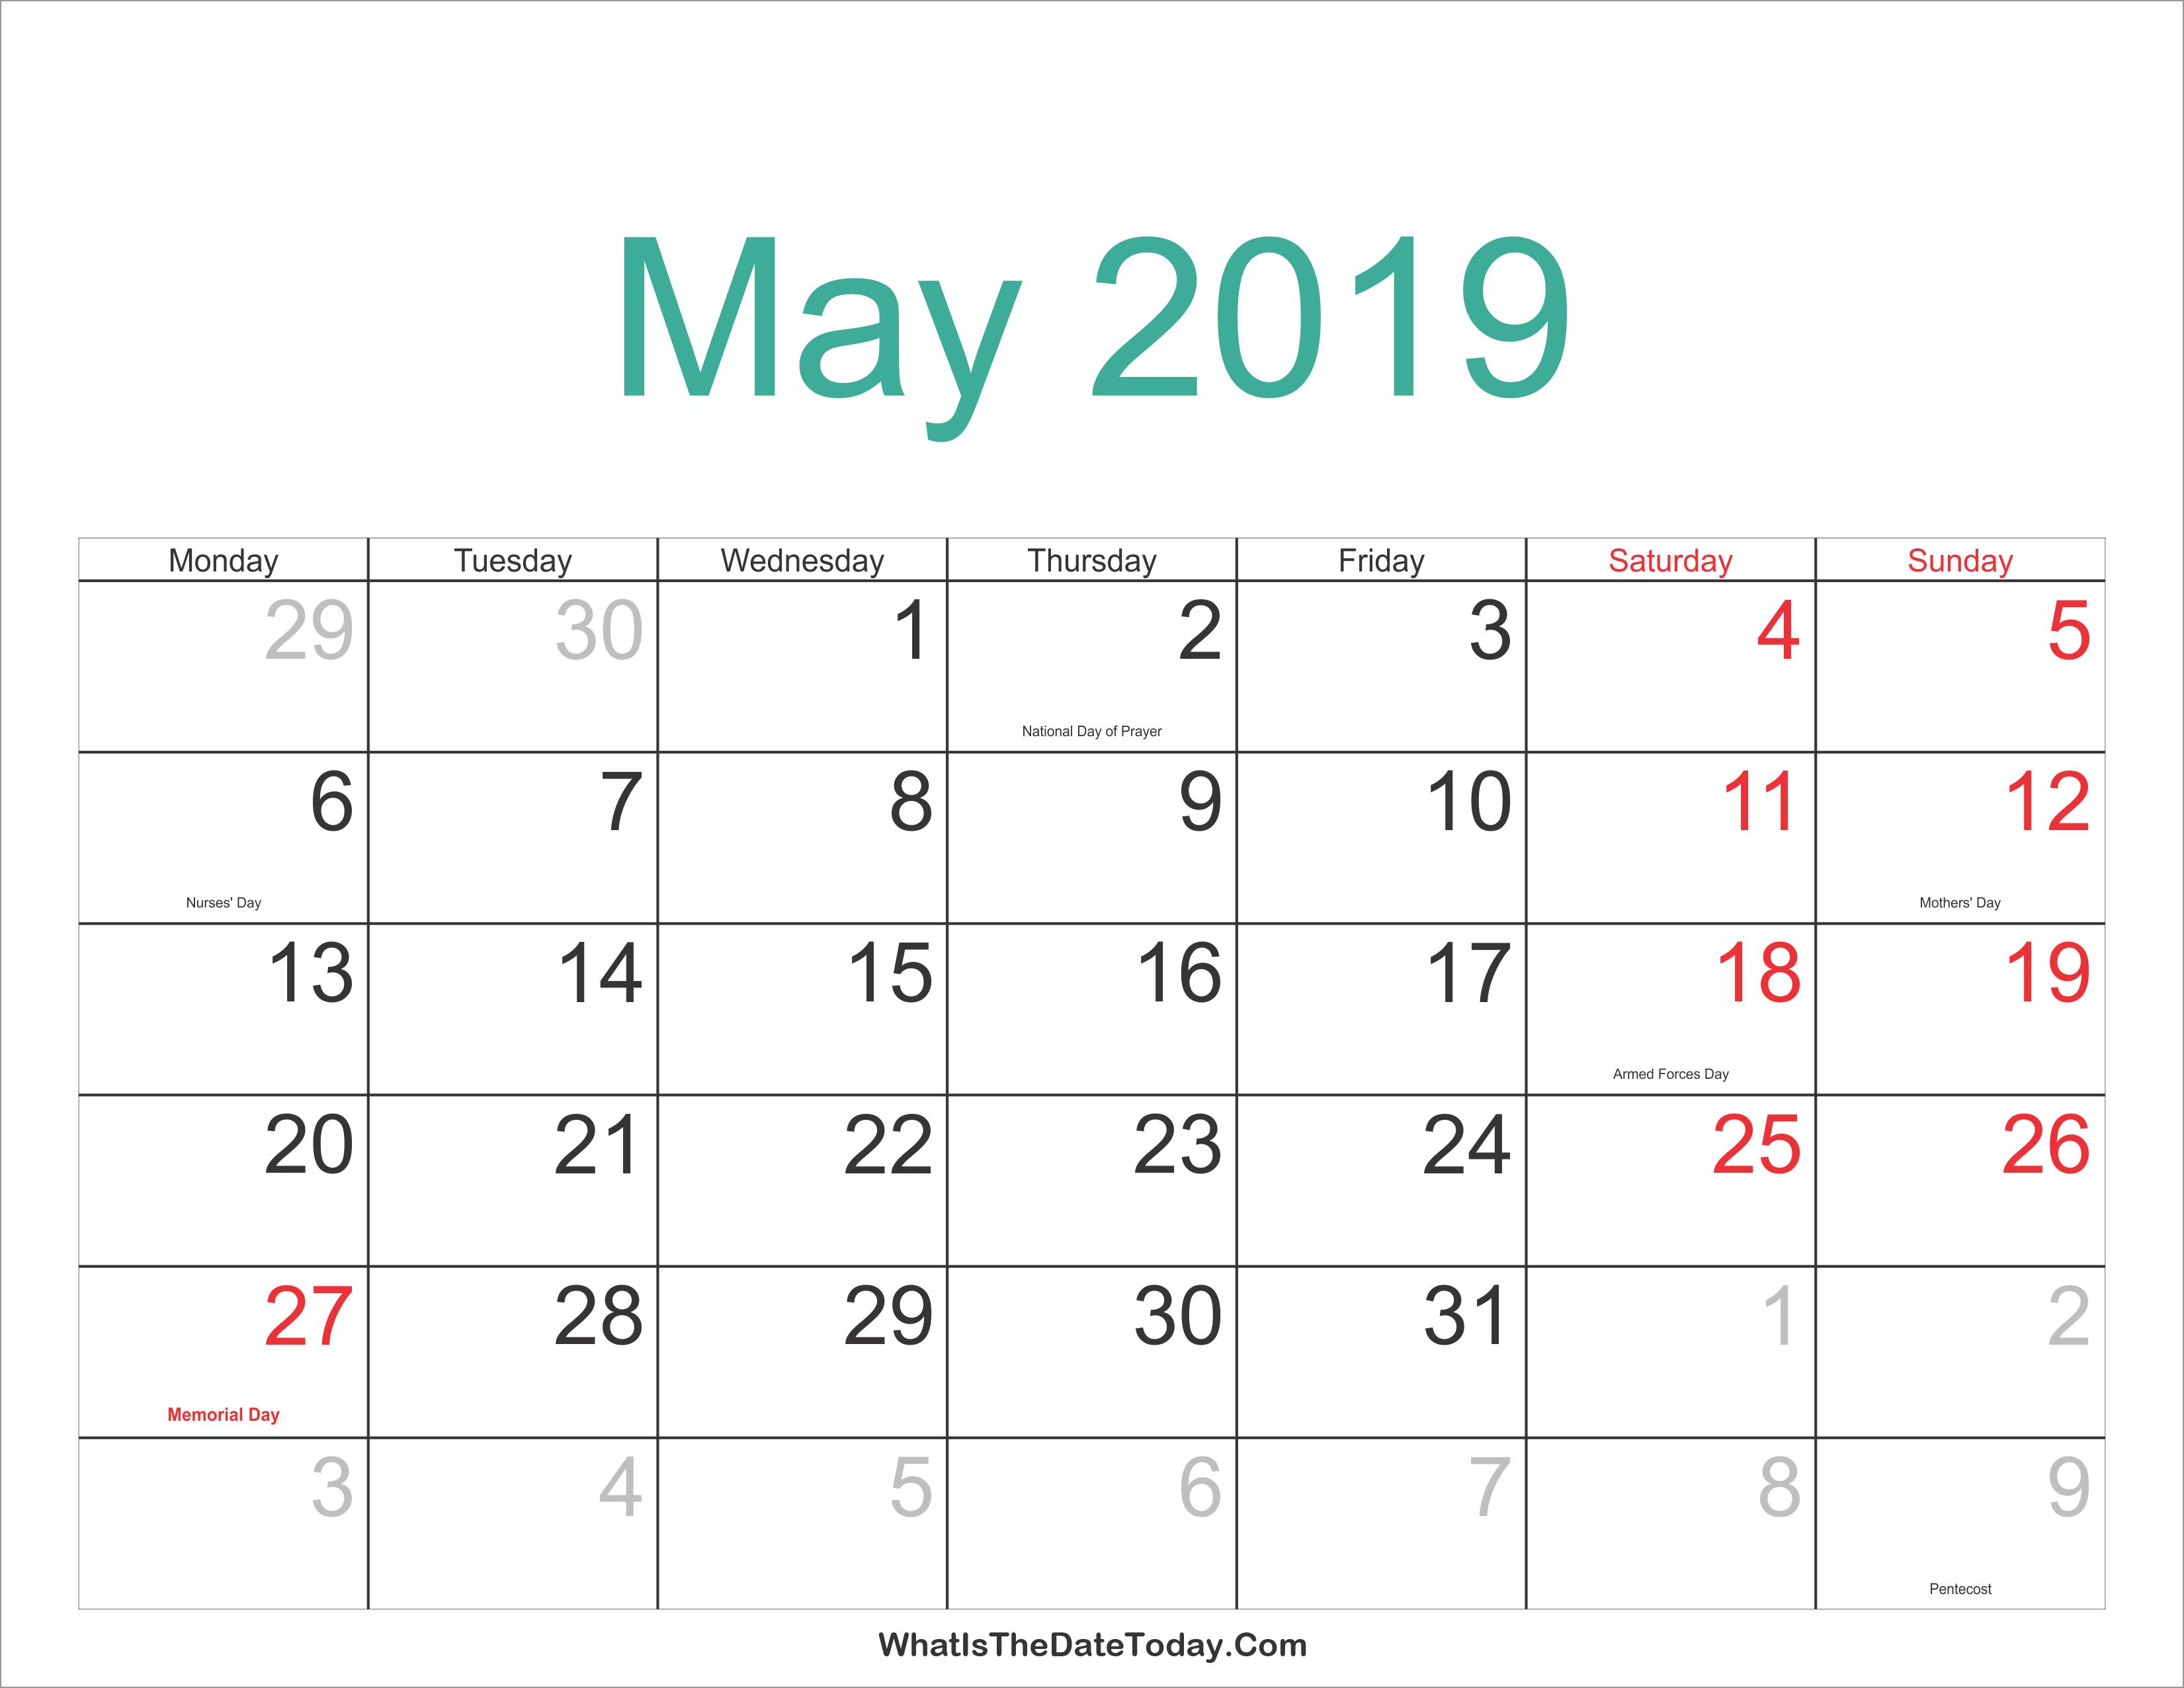 May 2019 Calendar With Holidays – Free Printable Calendar, Templates May 7 2019 Calendar